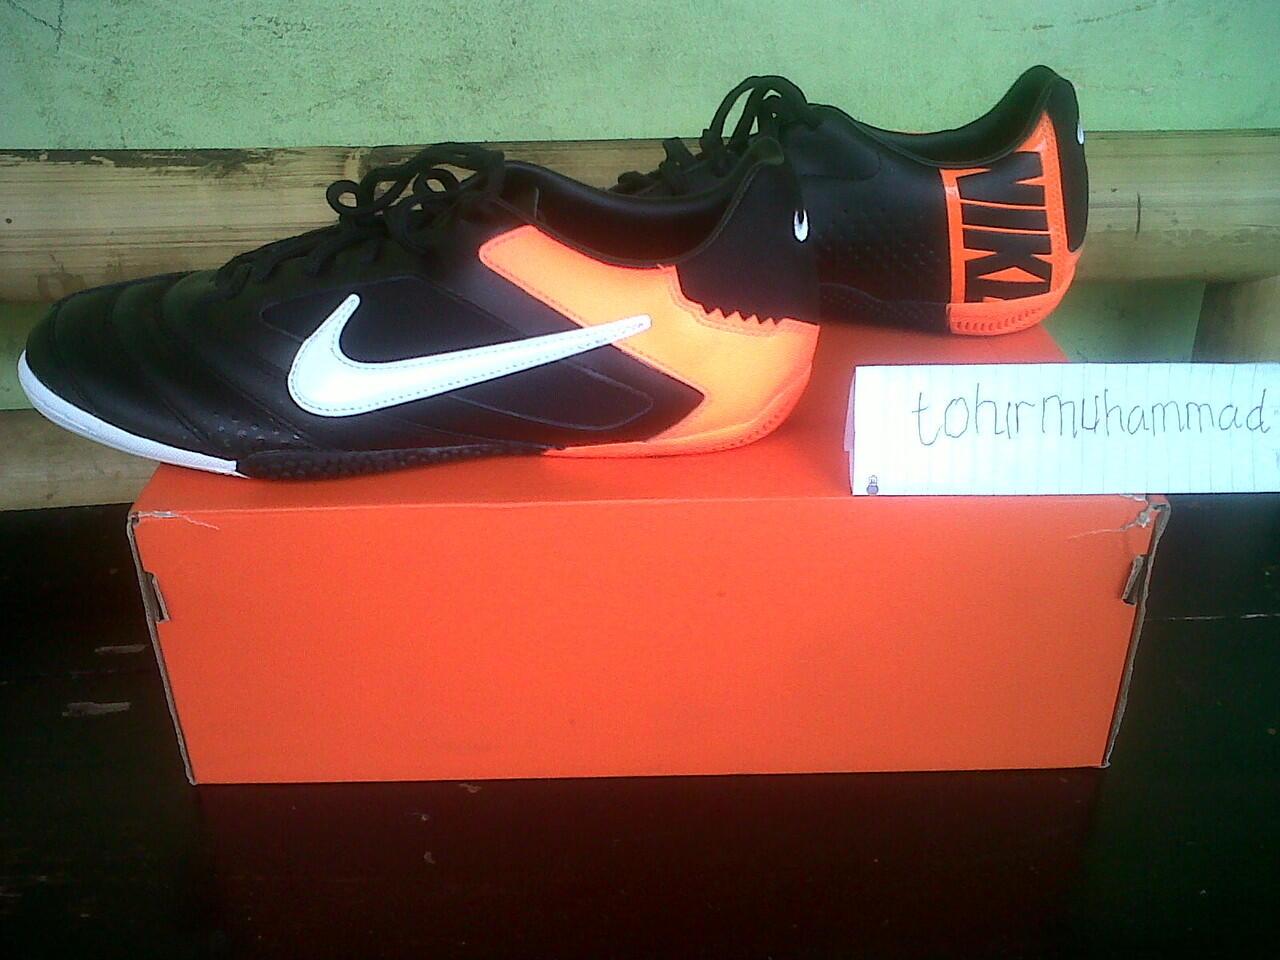 Terjual Jual sepatu futsal Nike 5 elastico pro black orange baru dan ... 2b9b4b0f16